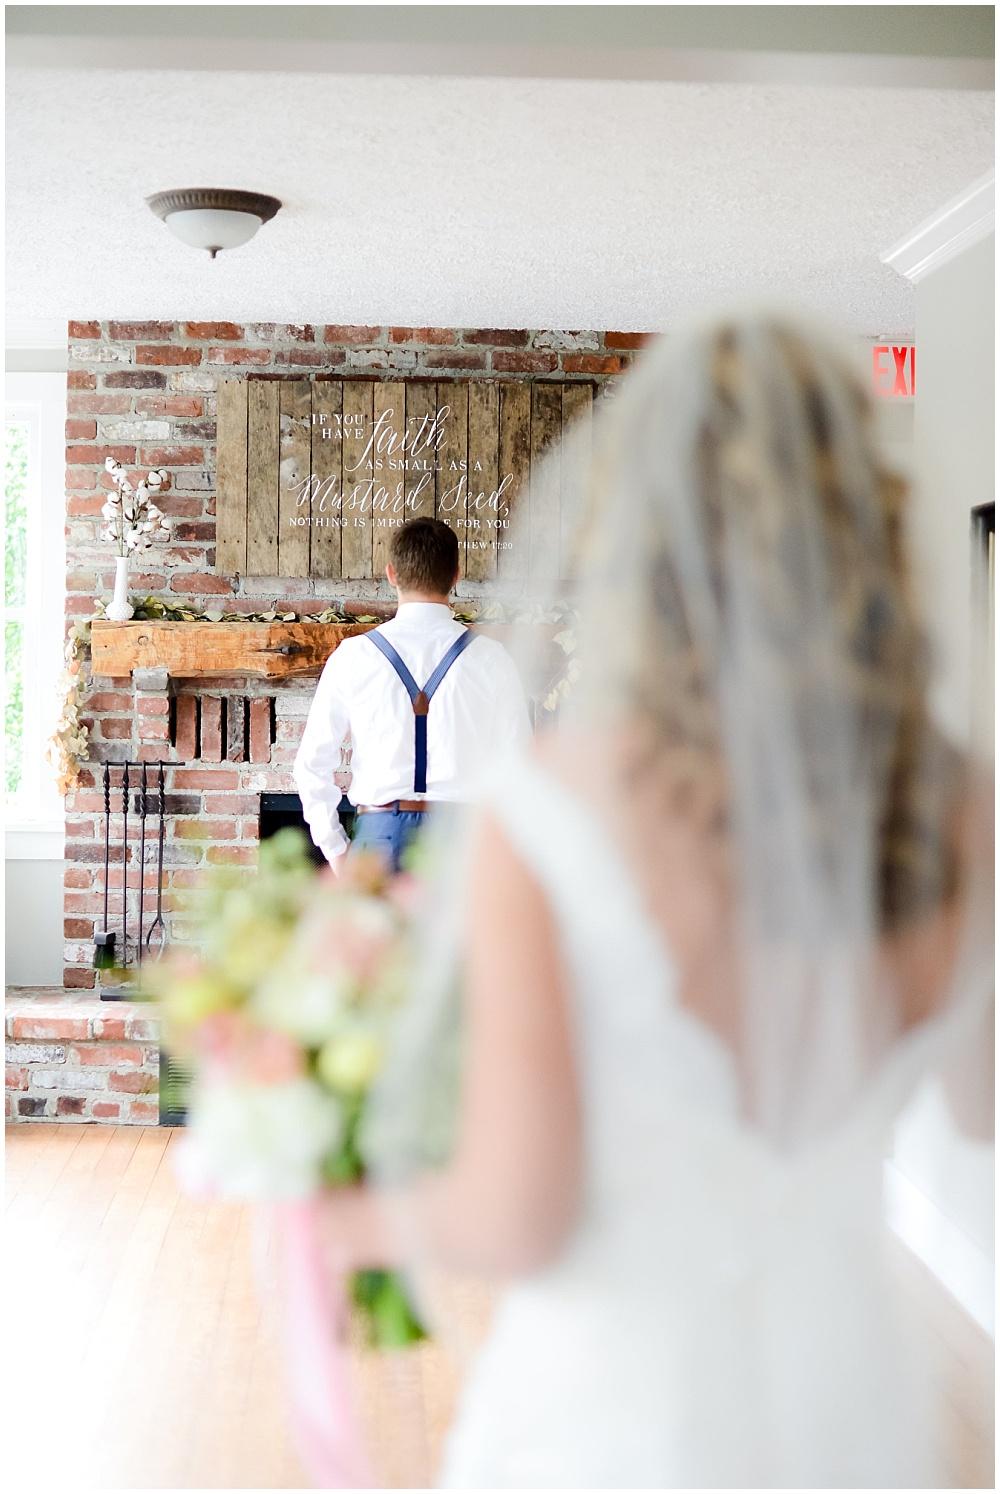 Bride and Groom first look | Mustard Seed Gardens Wedding by Sara Ackermann Photography & Jessica Dum Wedding Coordination